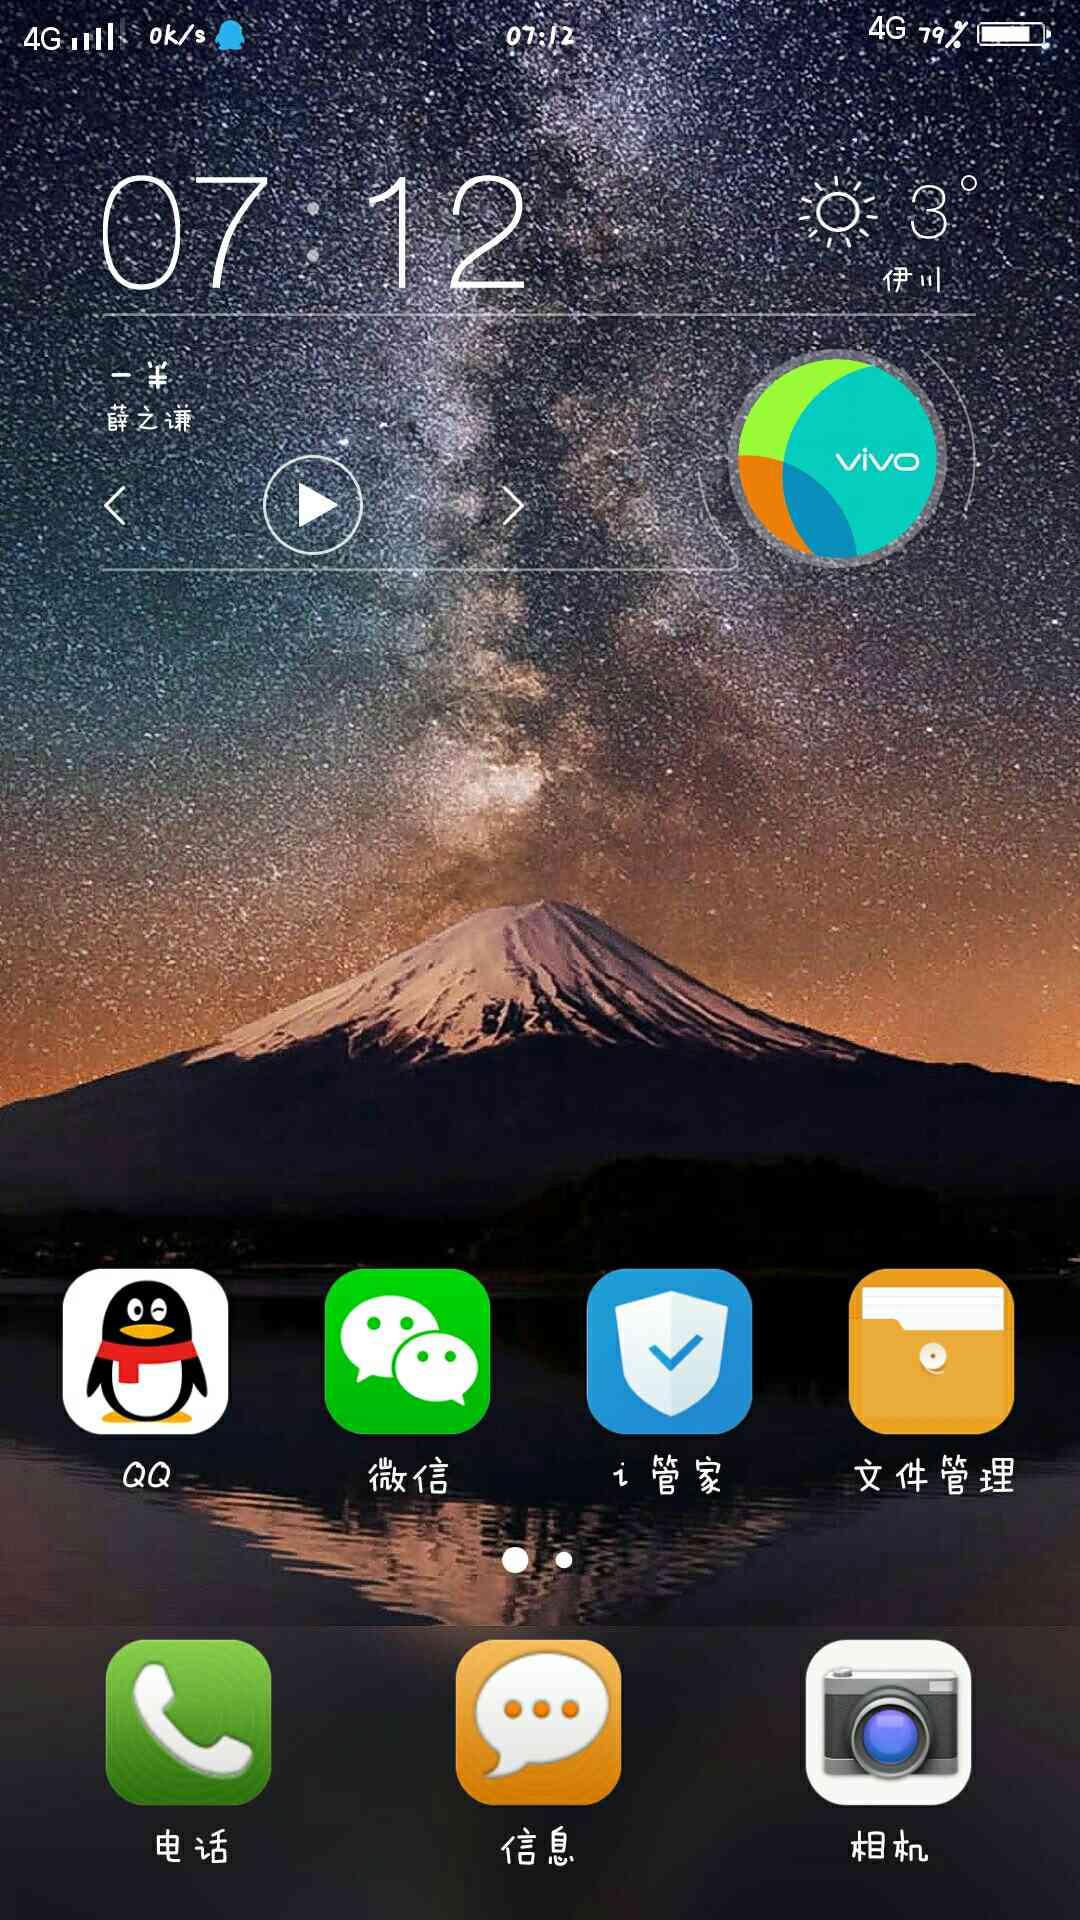 x7心电图信号 彩虹电池 自行车wifi